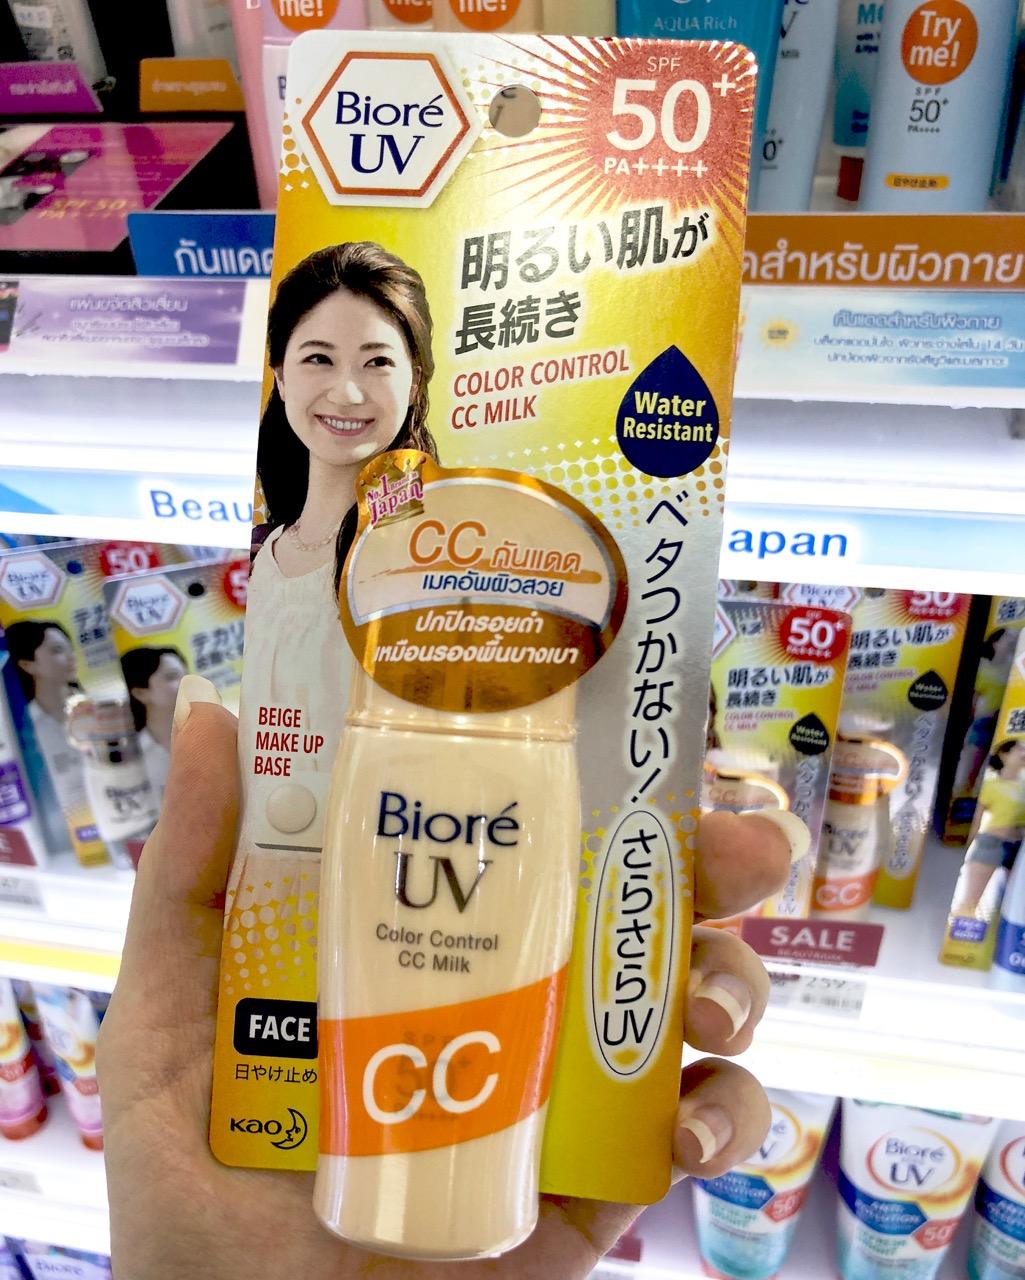 Bioré UV Color Control CC Milk SPF50 PA++++ Ostolakossa aurinkovoide kasvoille